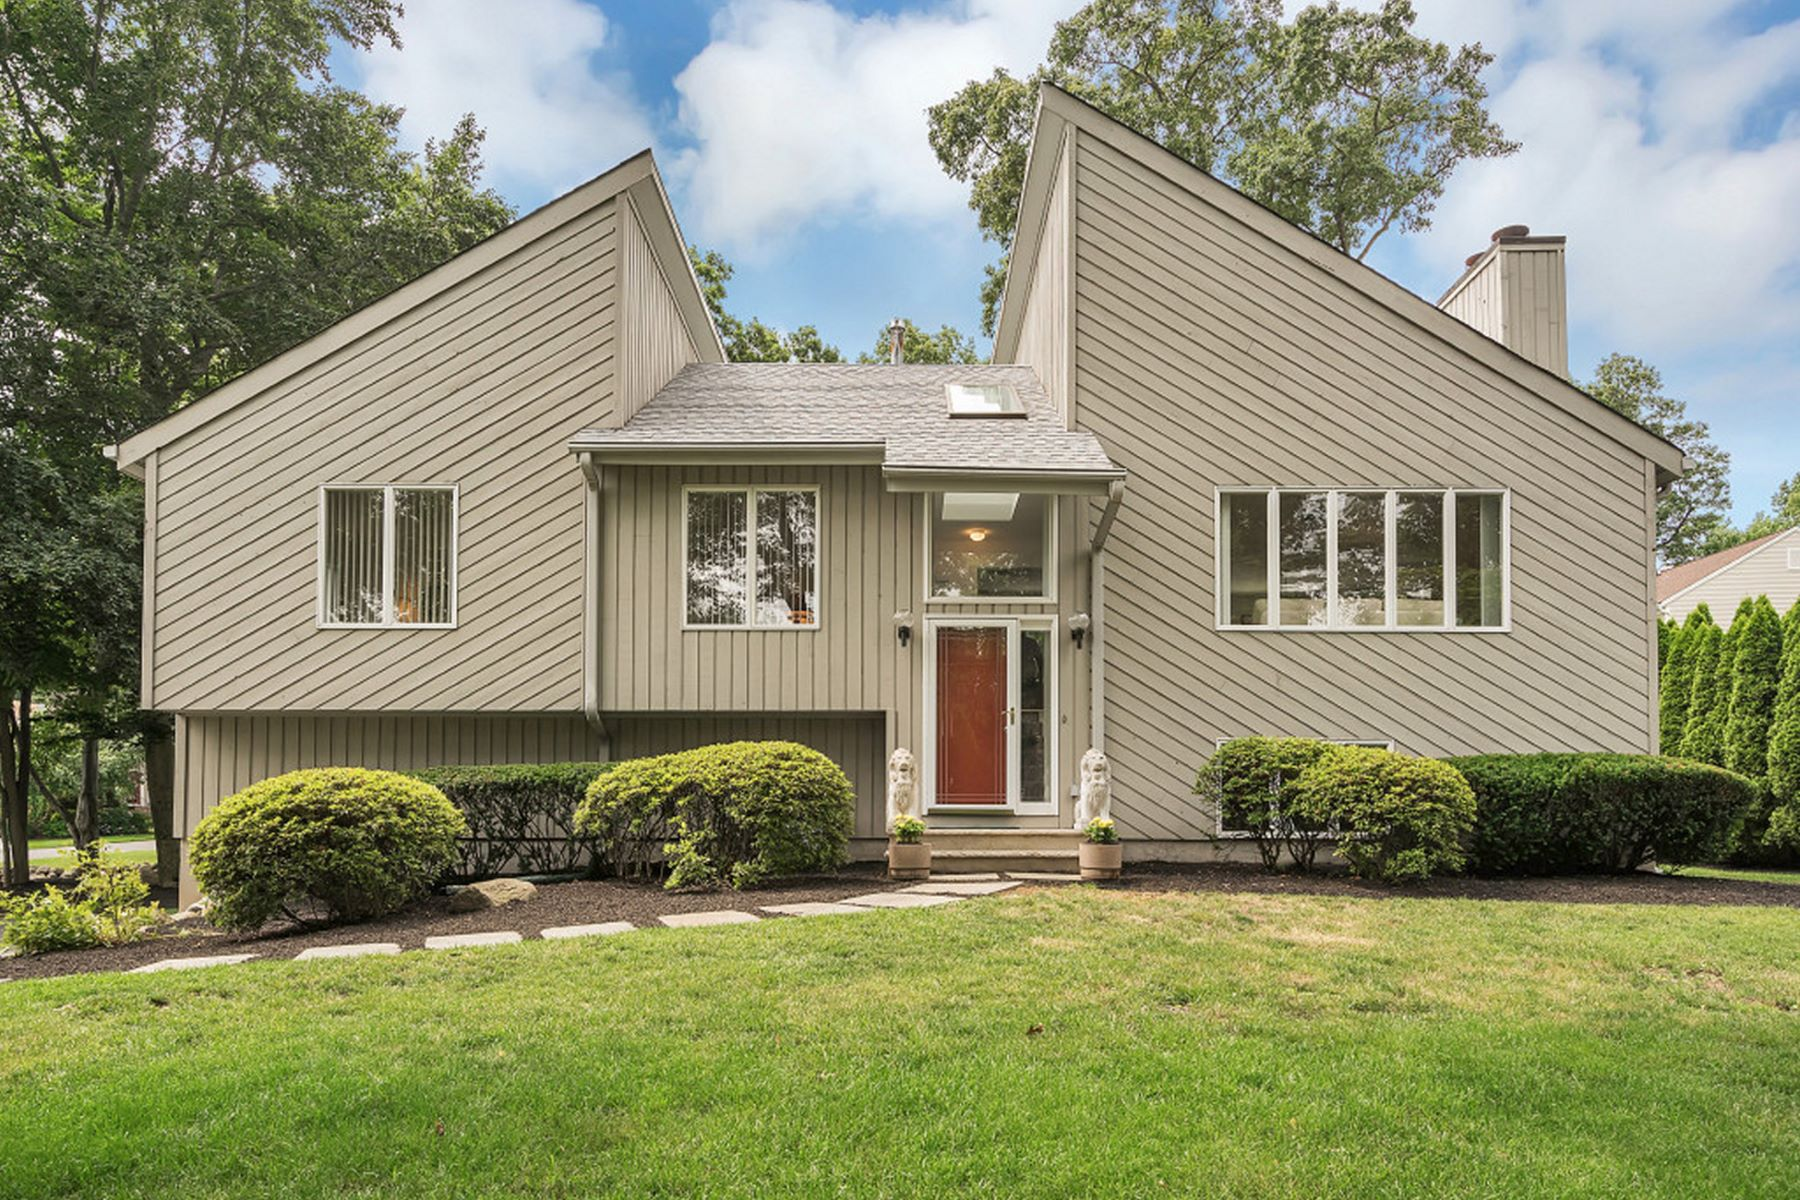 واحد منزل الأسرة للـ Sale في Pristine Contemporary Home On A Quiet No Through Street. 79 Yale Avenue, Wyckoff, New Jersey, 07481 United States